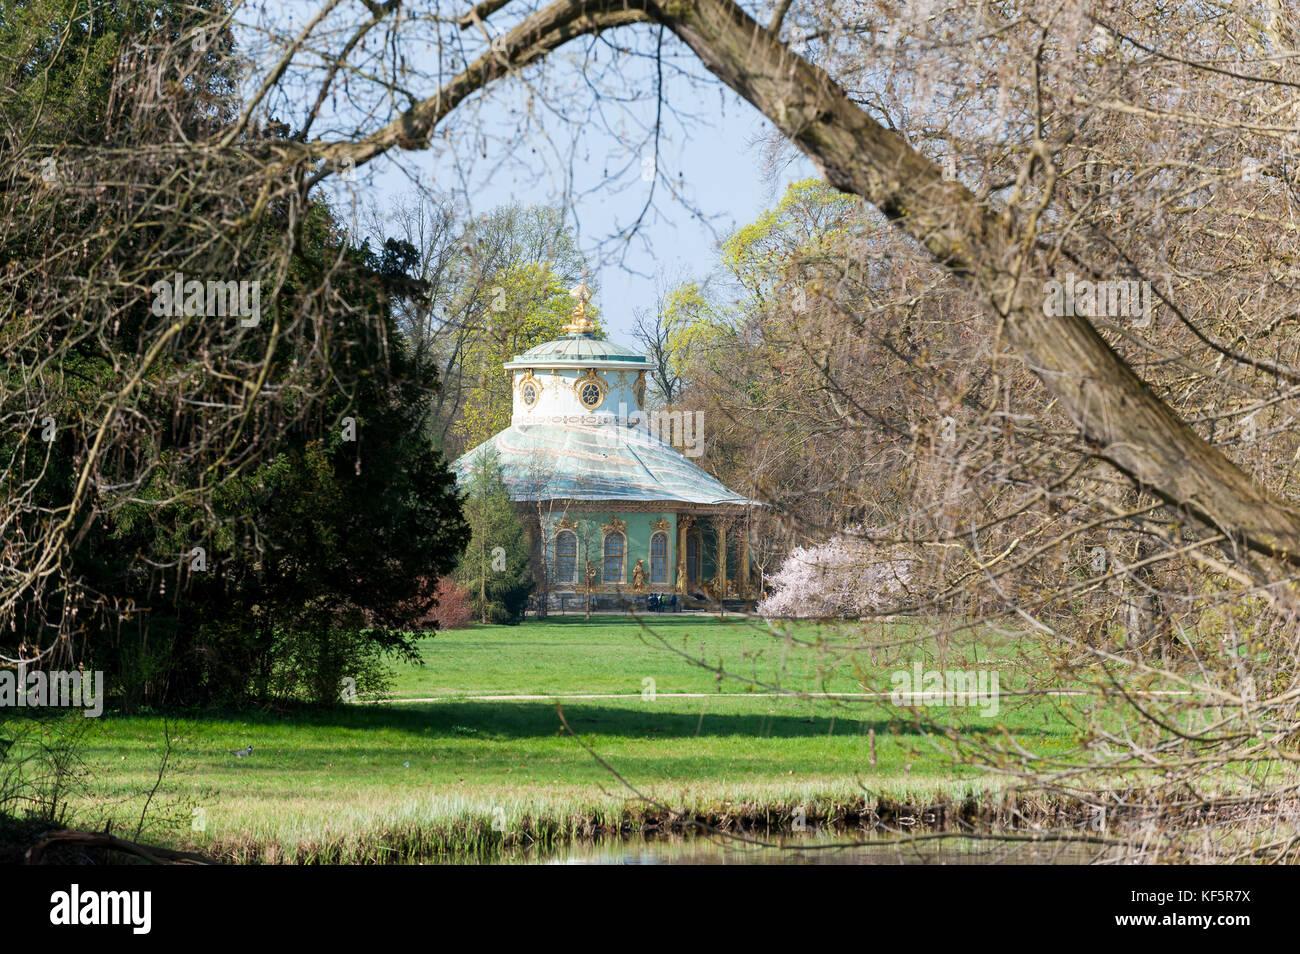 Chinese House, Potsdam, Brandenburg State, Germany, Europe - Stock Image